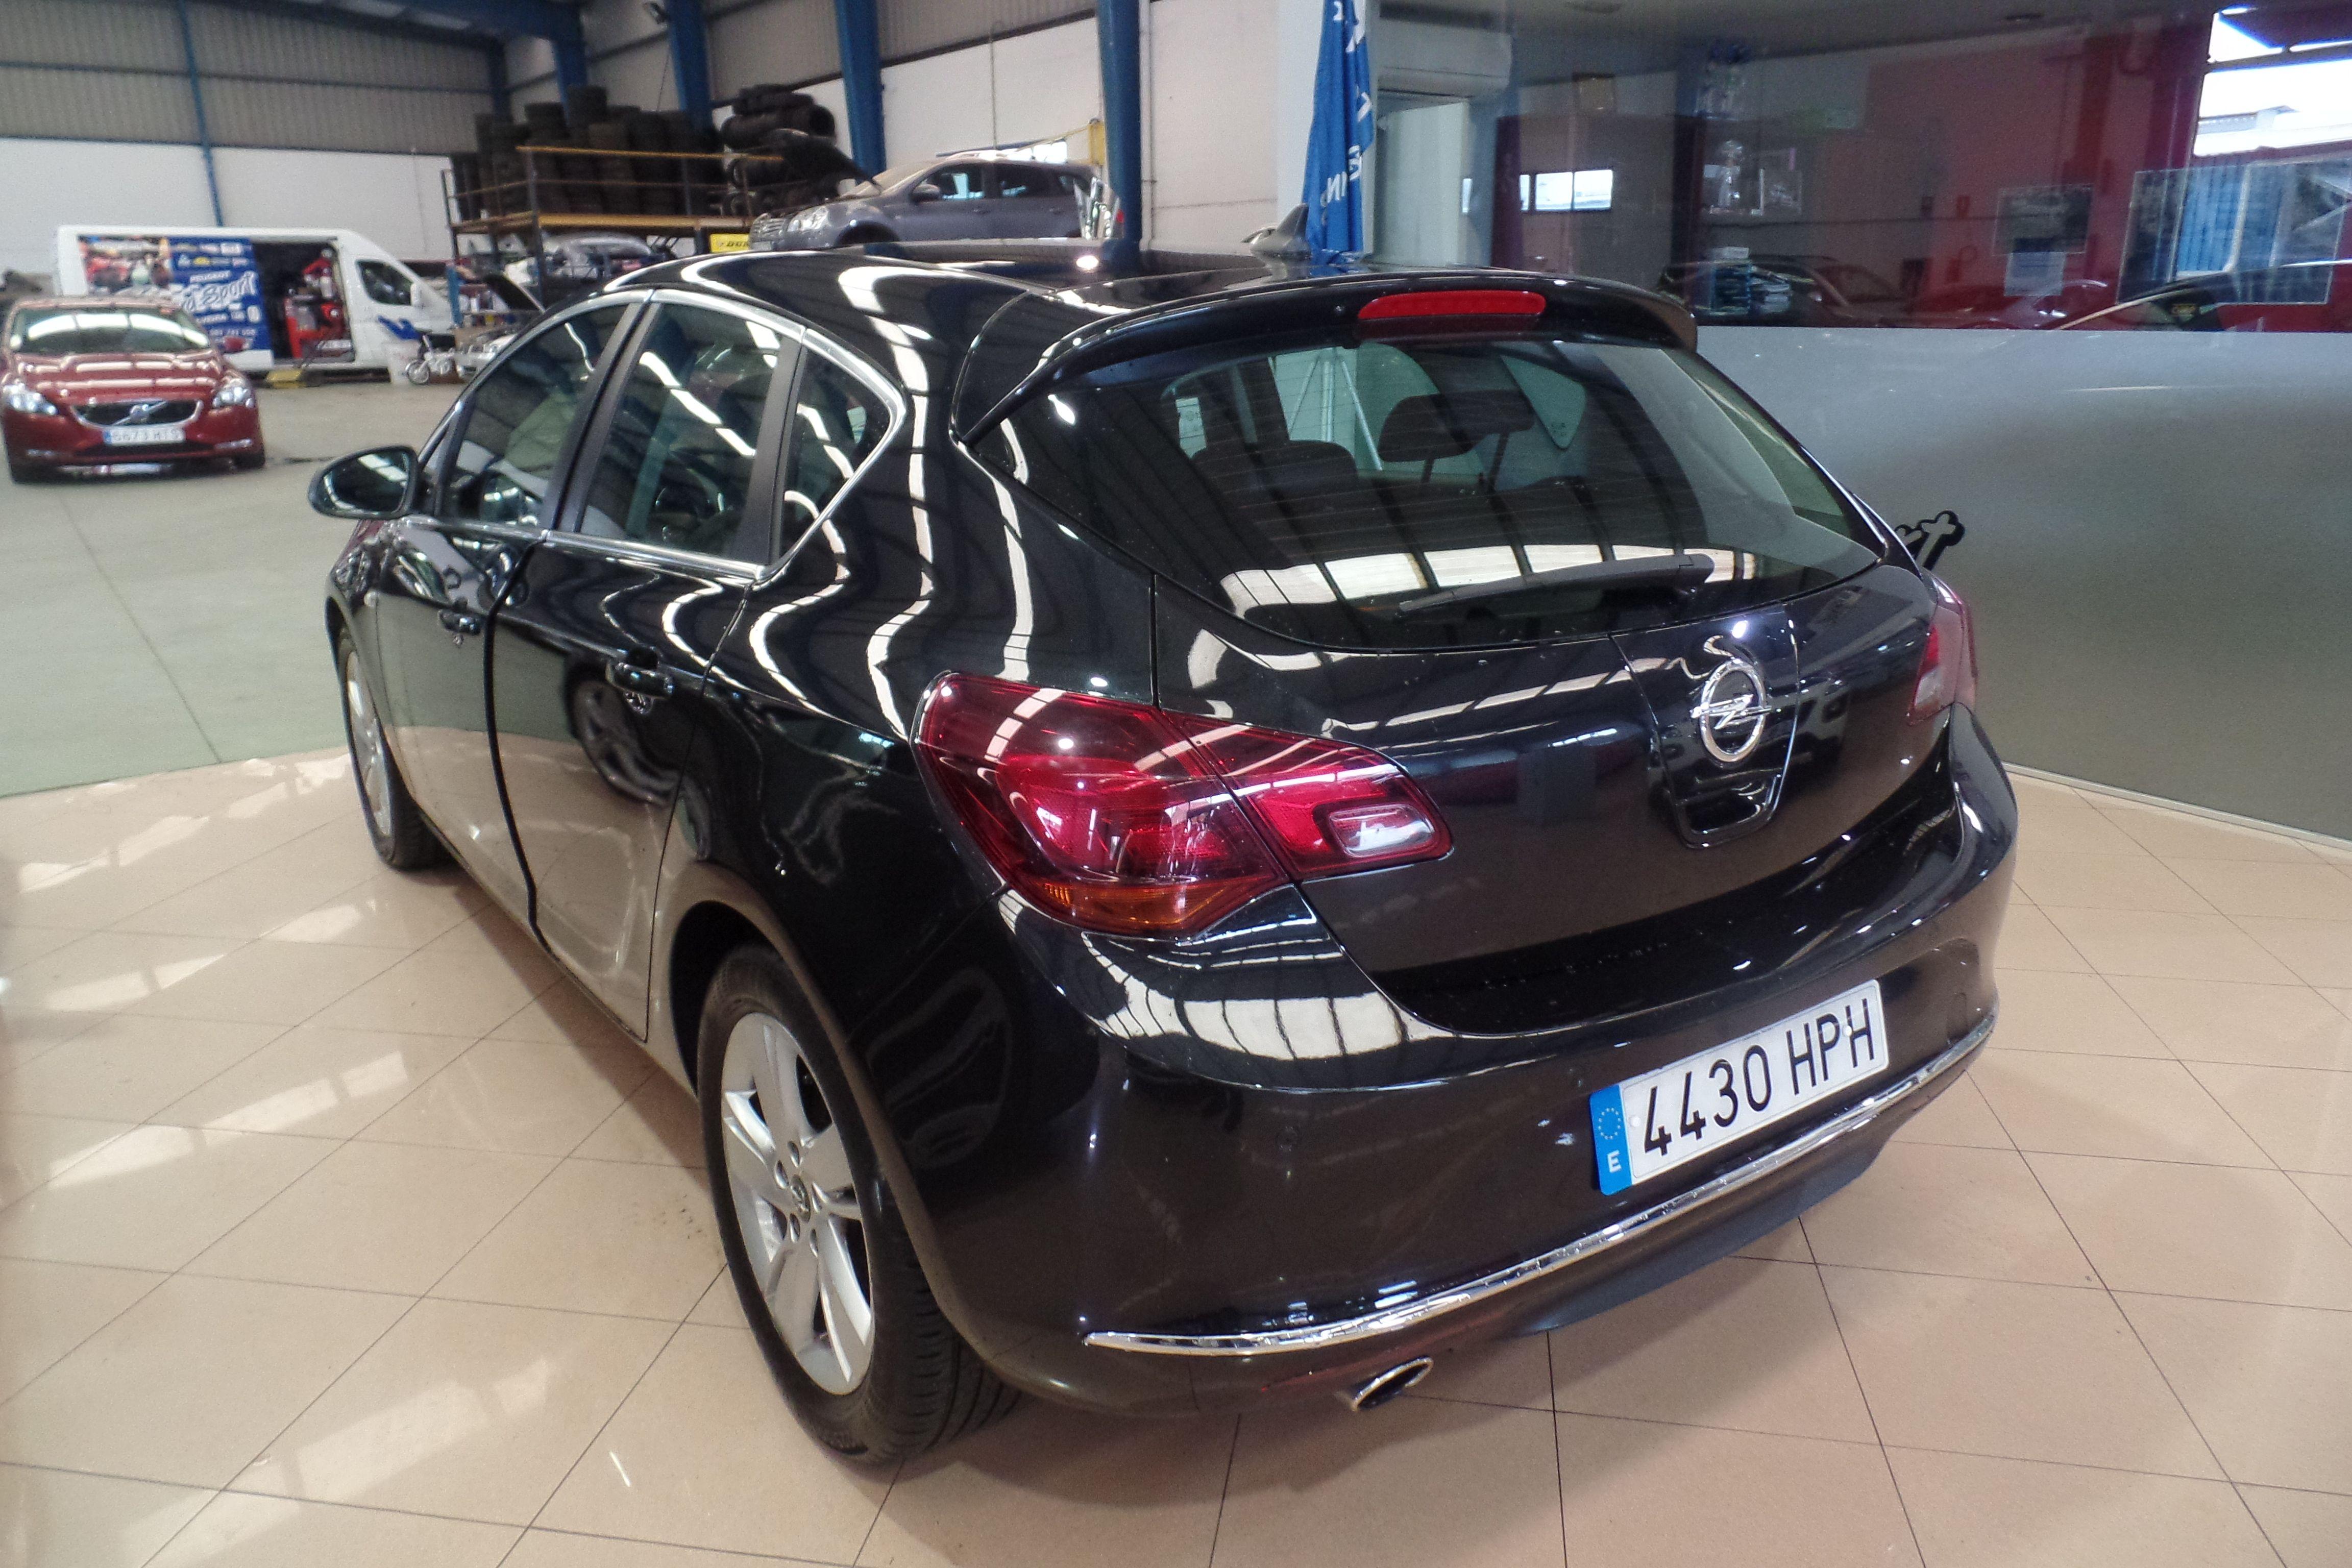 OPEL Astra 2.0 CDTi SS 165 CV Sportive (4430-HPH): Servicios Peugeot de Senra Sport